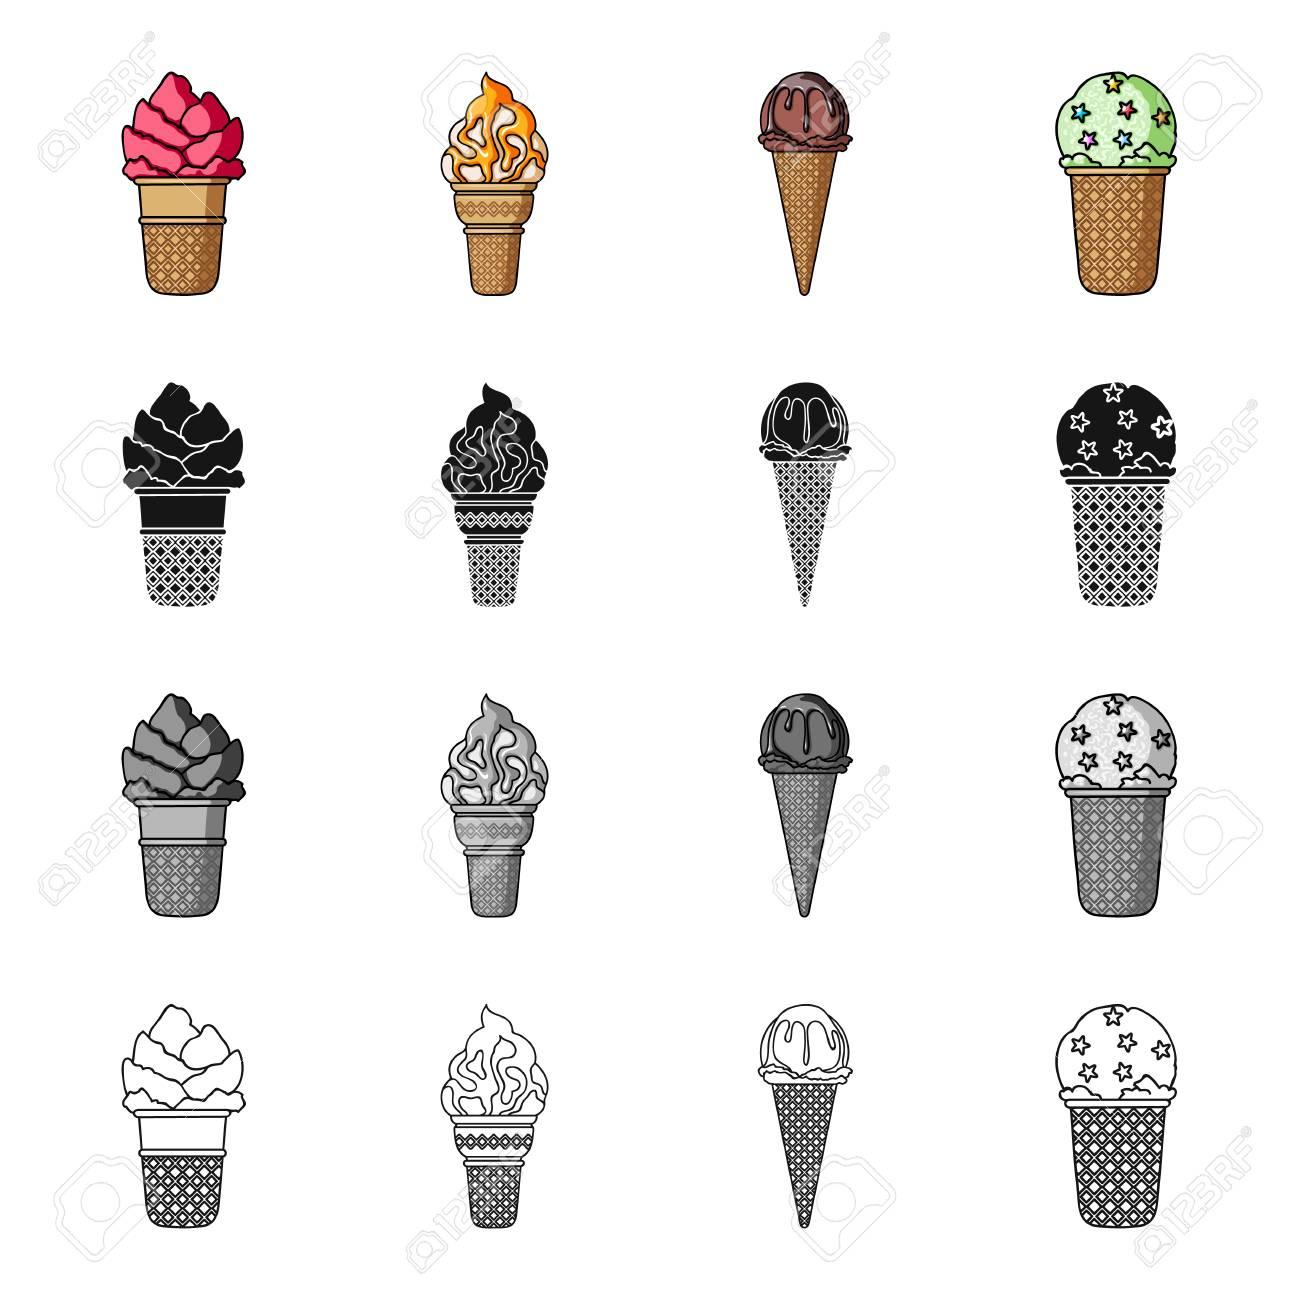 Distinctive Ice Food Ice Cream Set Collectionicons Ice Cream Styles Types Ice Food Different Types Ice Cream Cones Ice Cream Set Types Different Types nice food Types Of Ice Cream